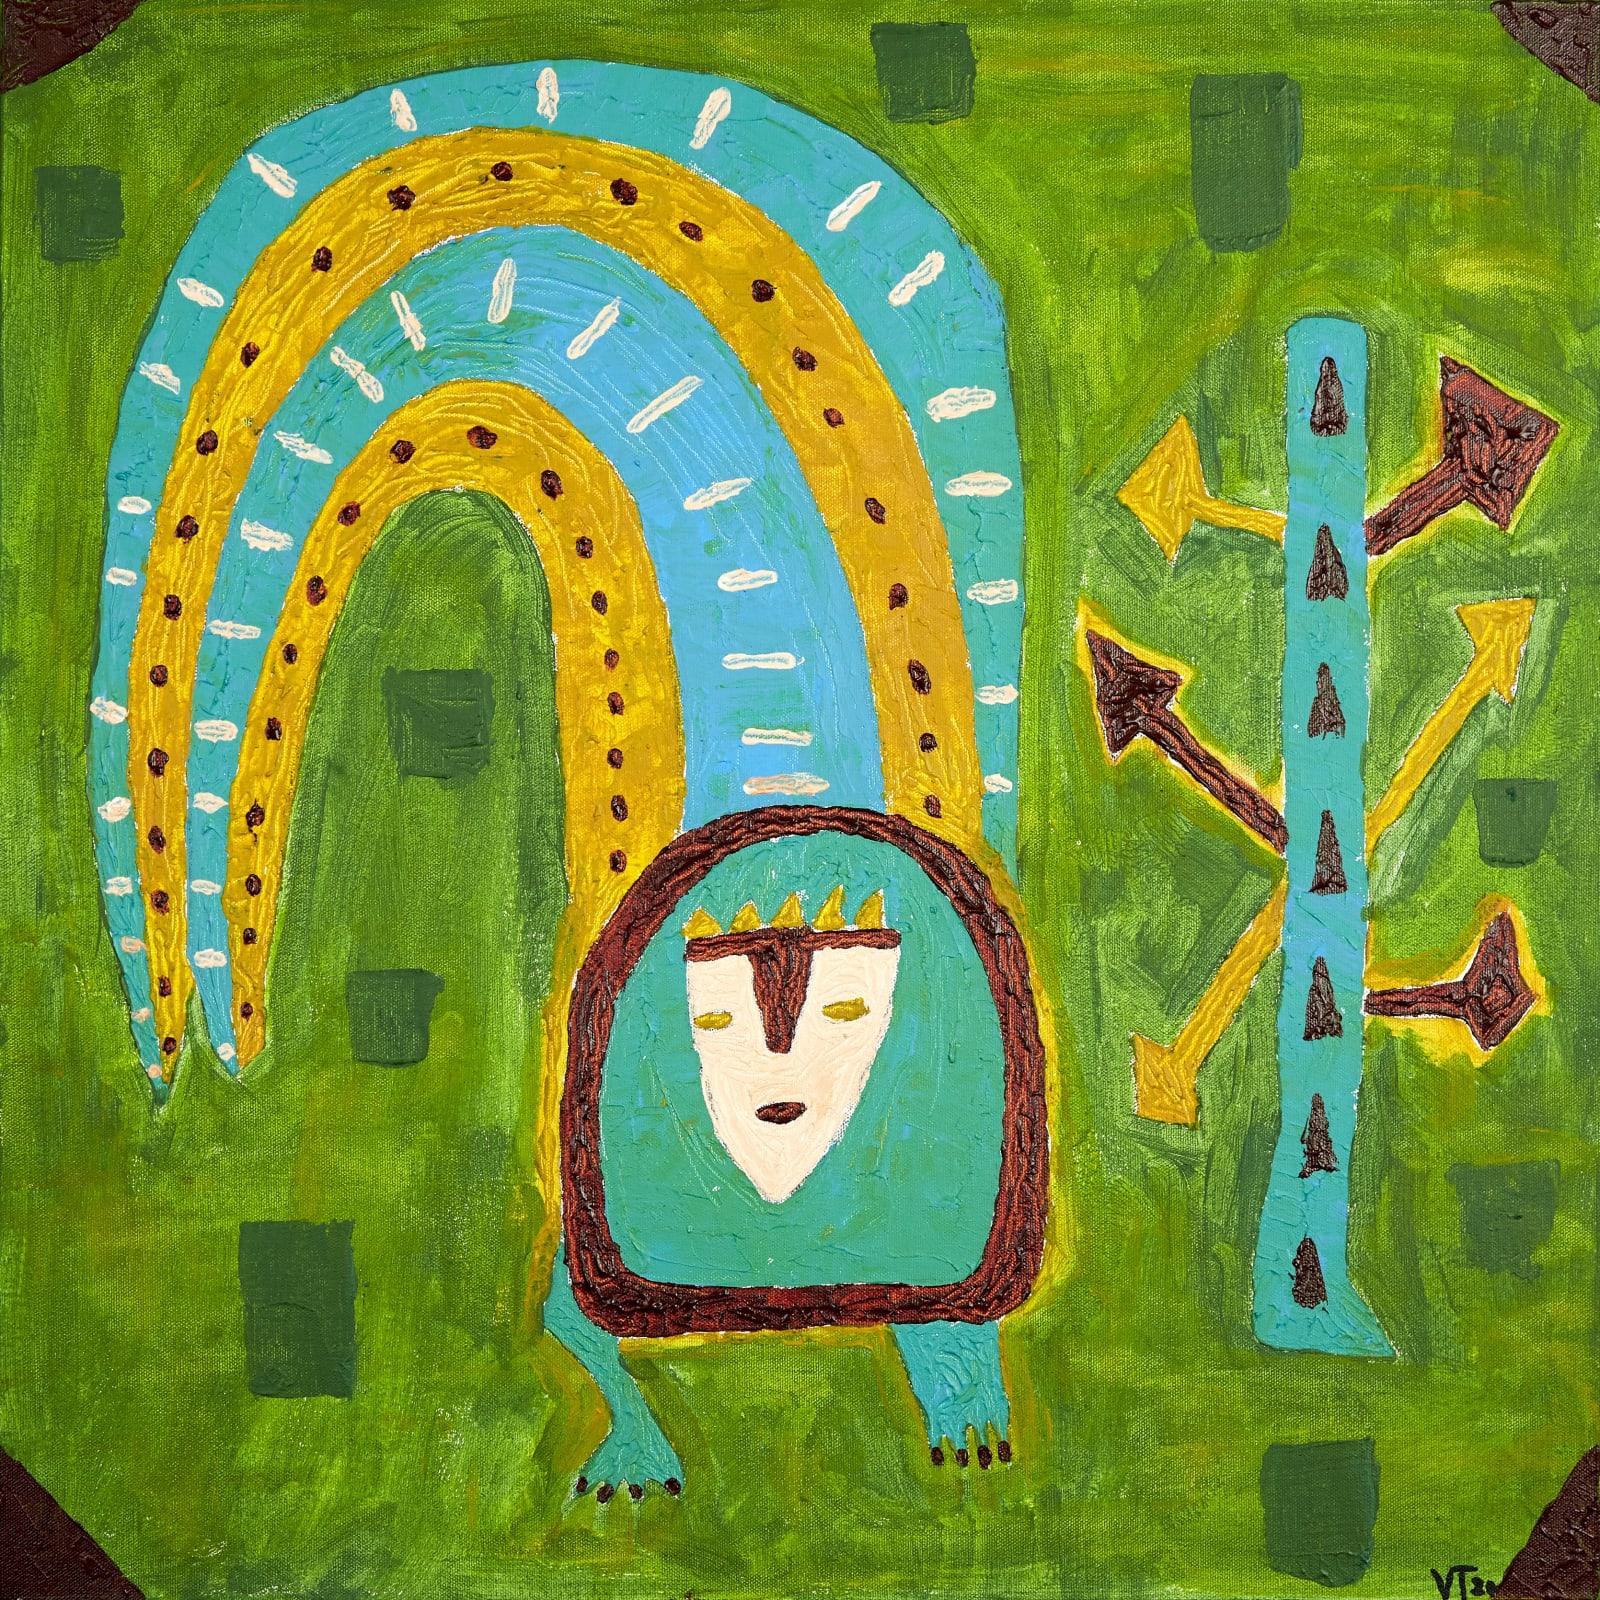 Véronique Tadjo  Gardien de l'eau 1, 2020  Acrylic on canvas  60 x 60 cm  23 5/8 x 23 5/8 in